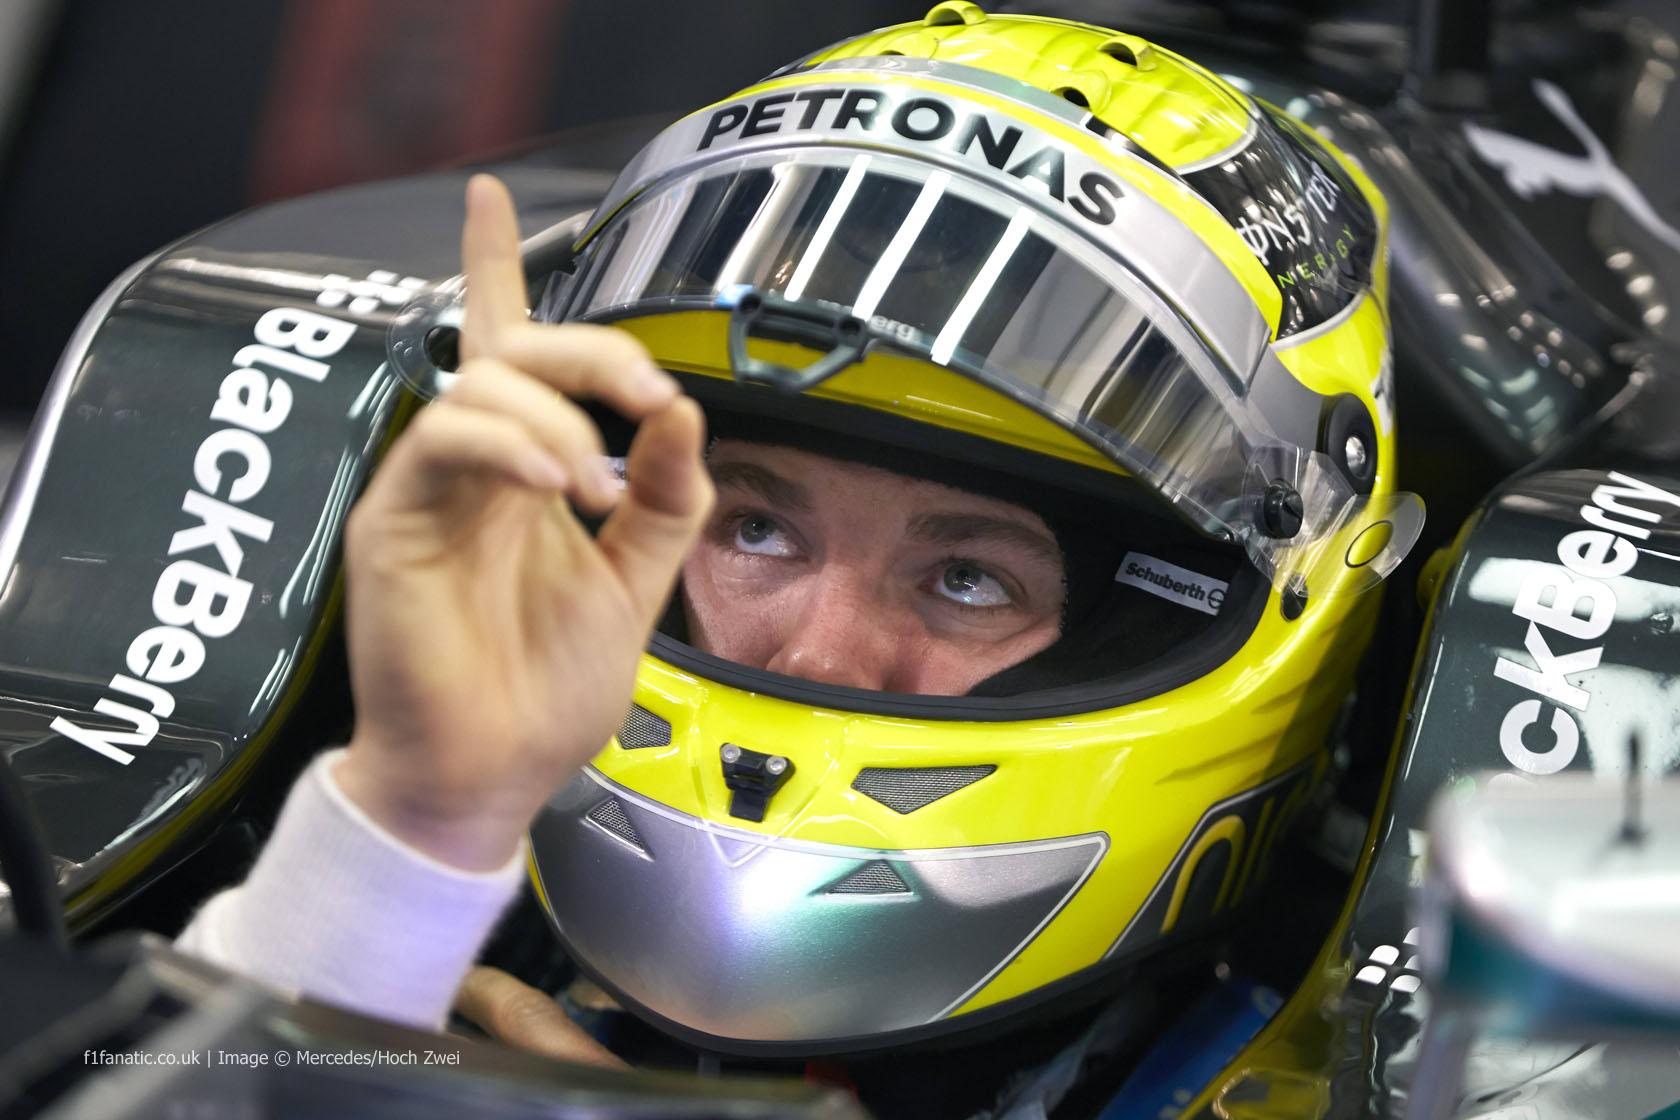 Nico Rosberg, Mercedes, Bahrain, 2014